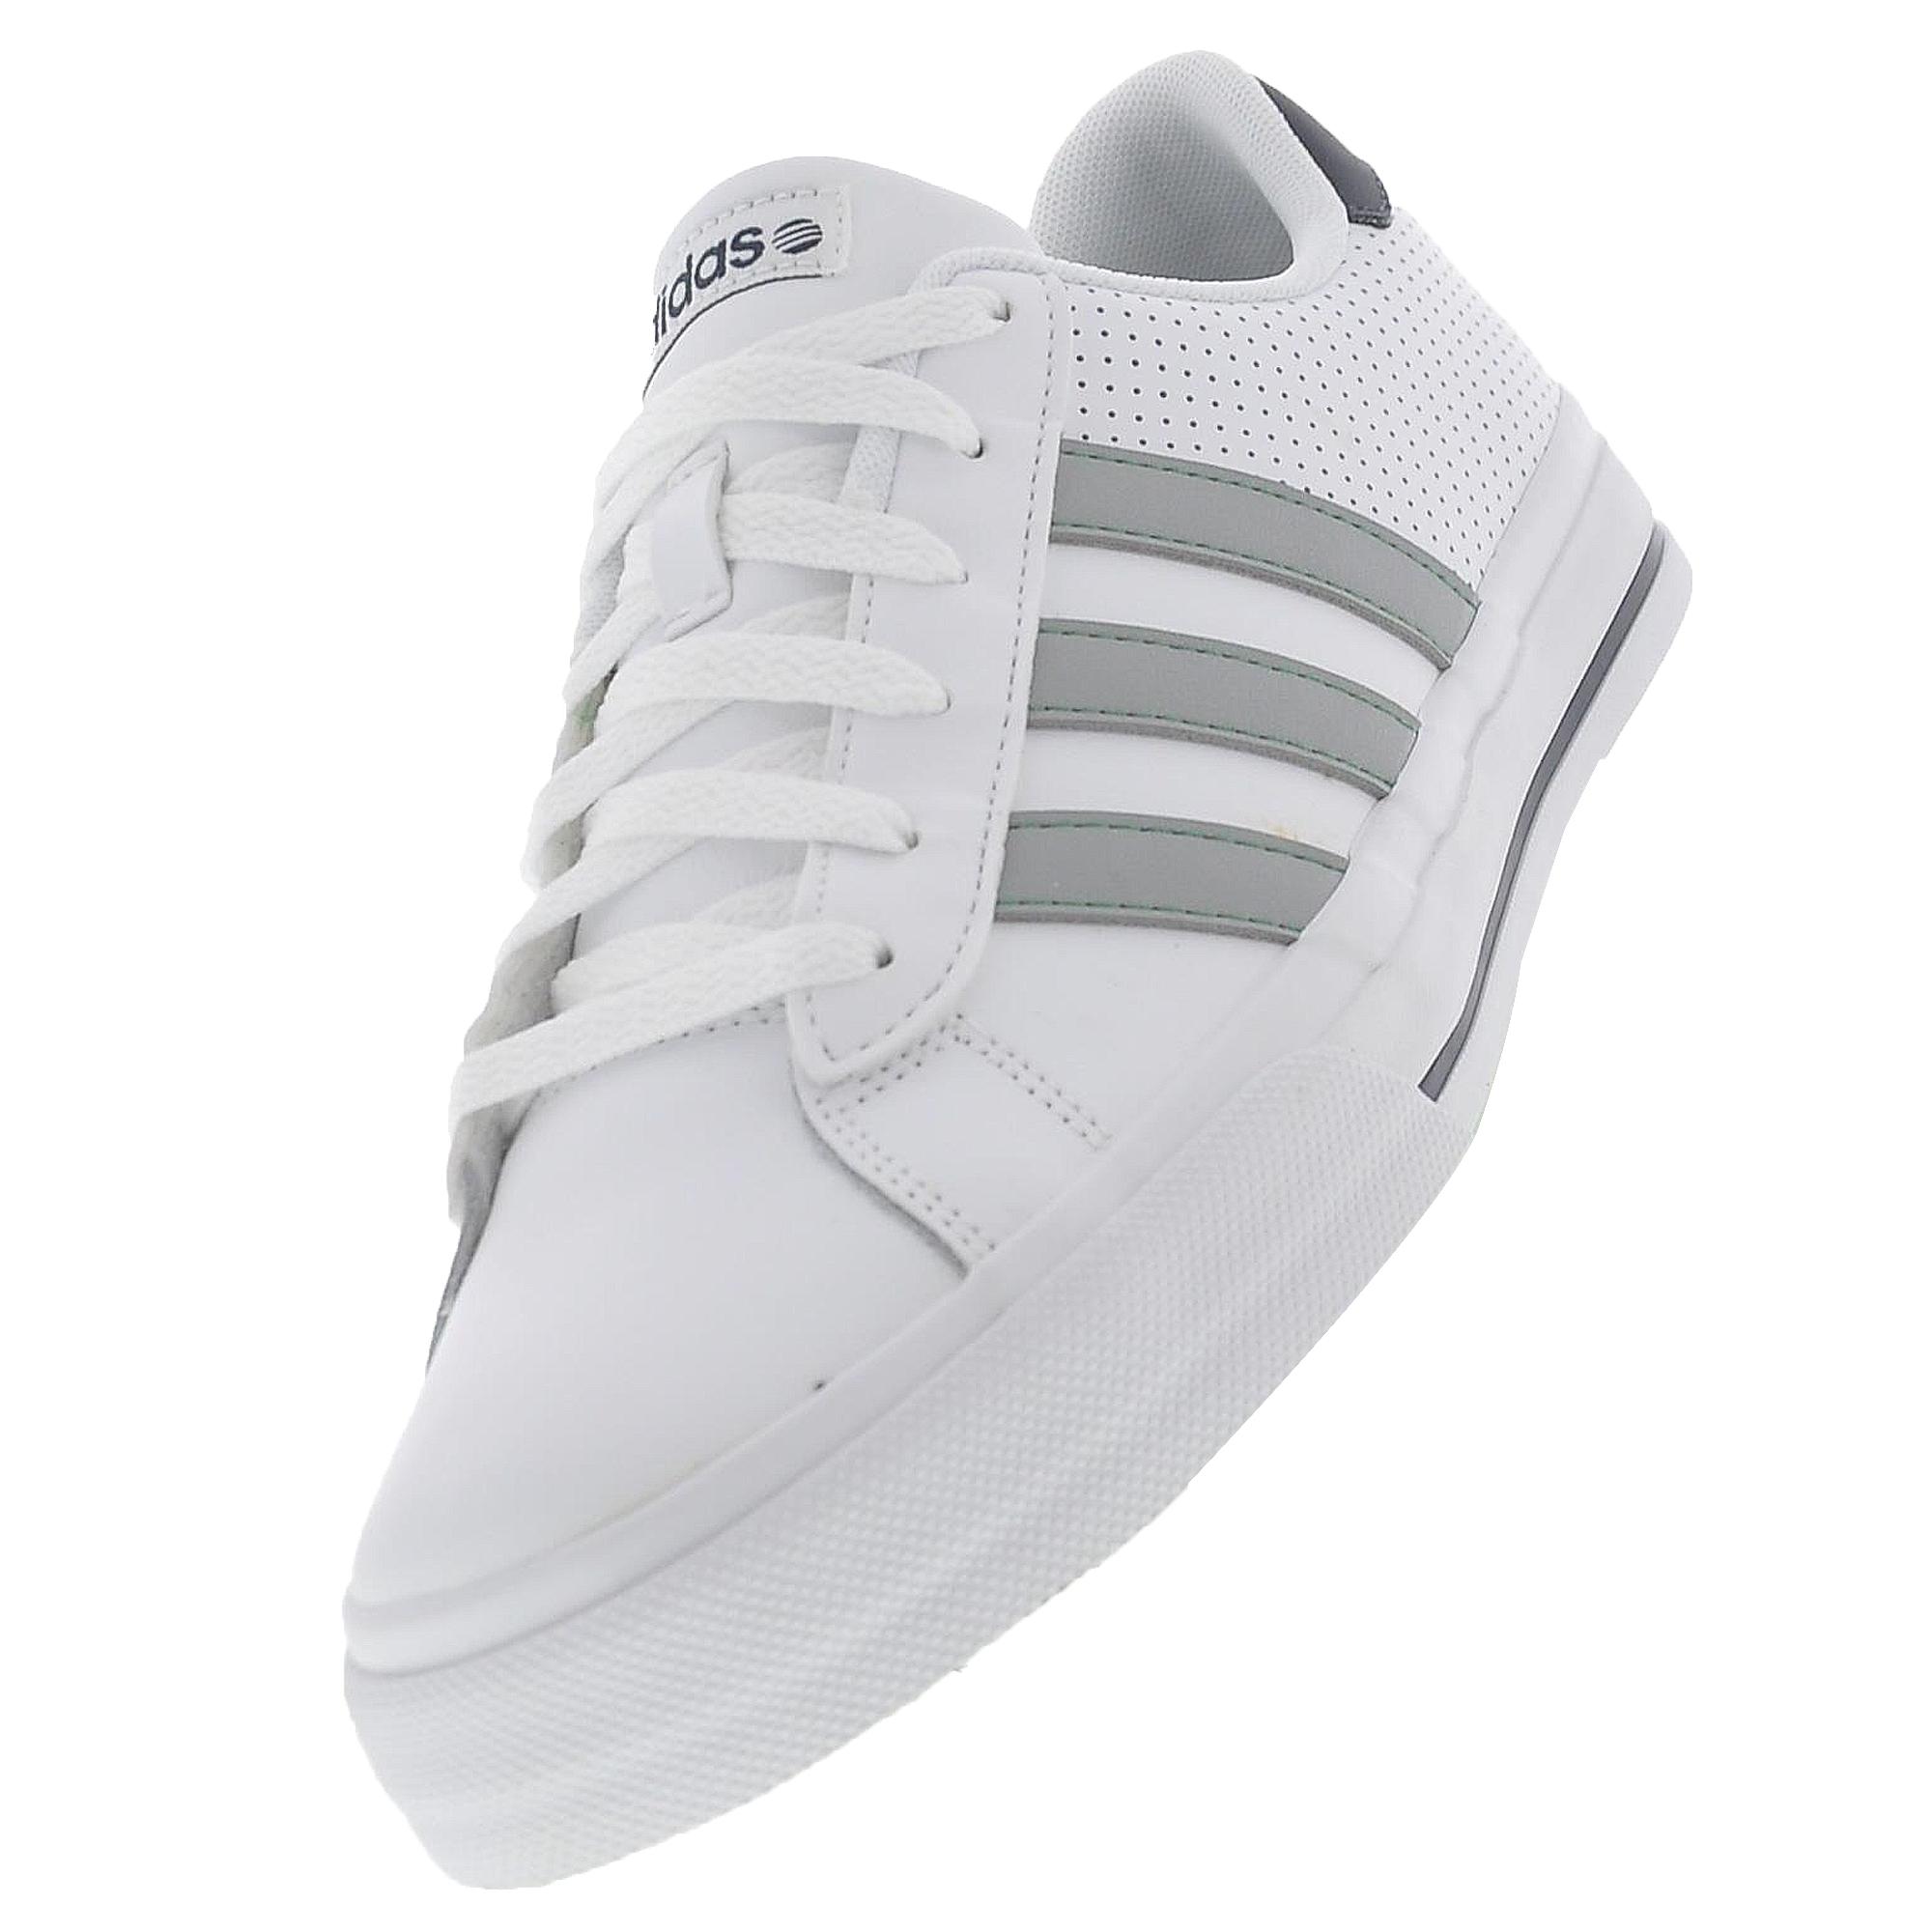 70aec20aeb adidas Se Daily Vulc SS14 Erkek Spor Ayakkabı  F39045 - Barcin.com